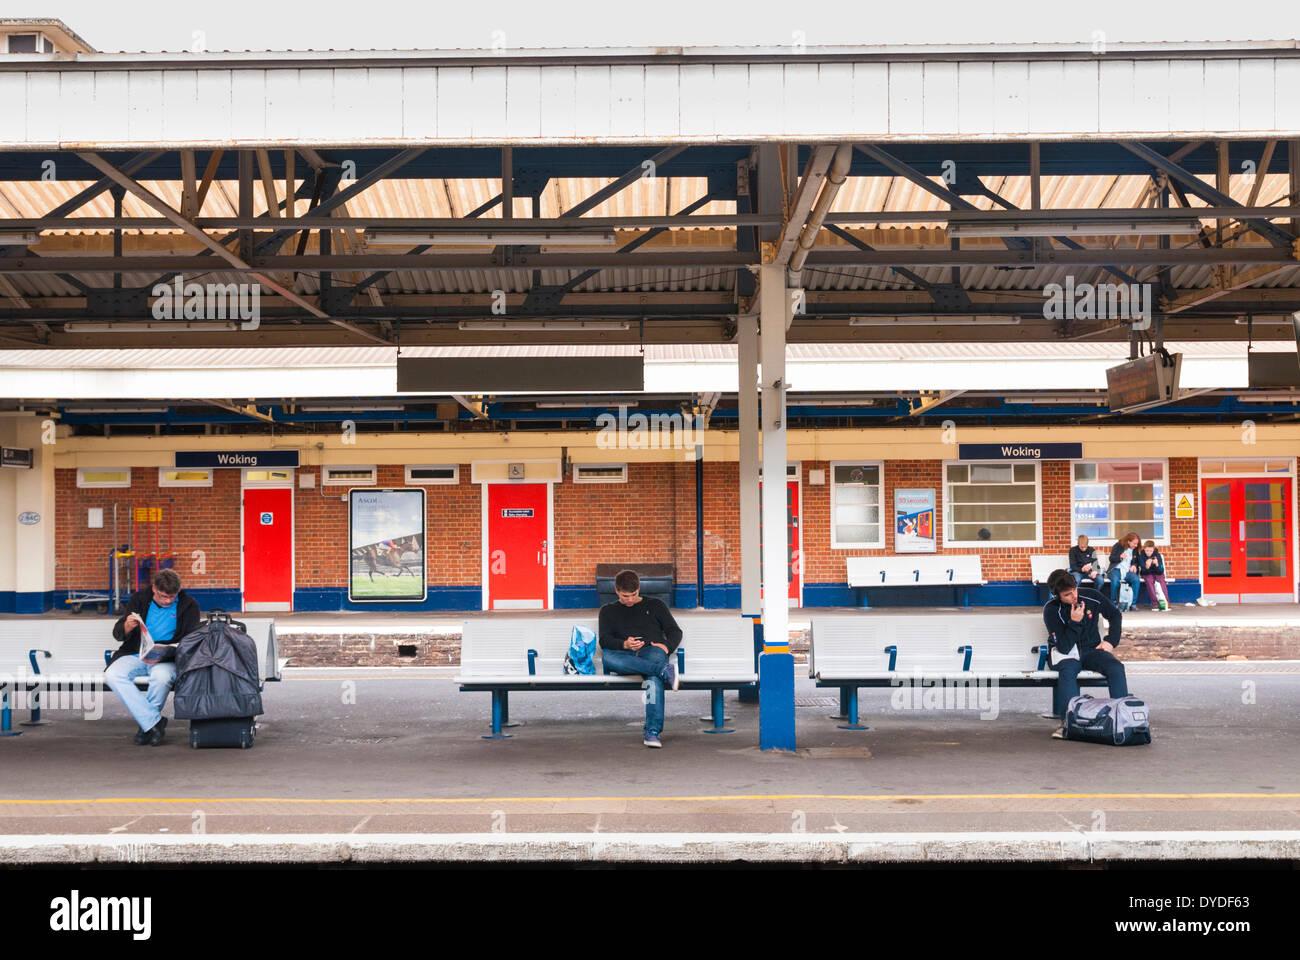 Passengers on platform benches waiting at Woking Station. - Stock Image